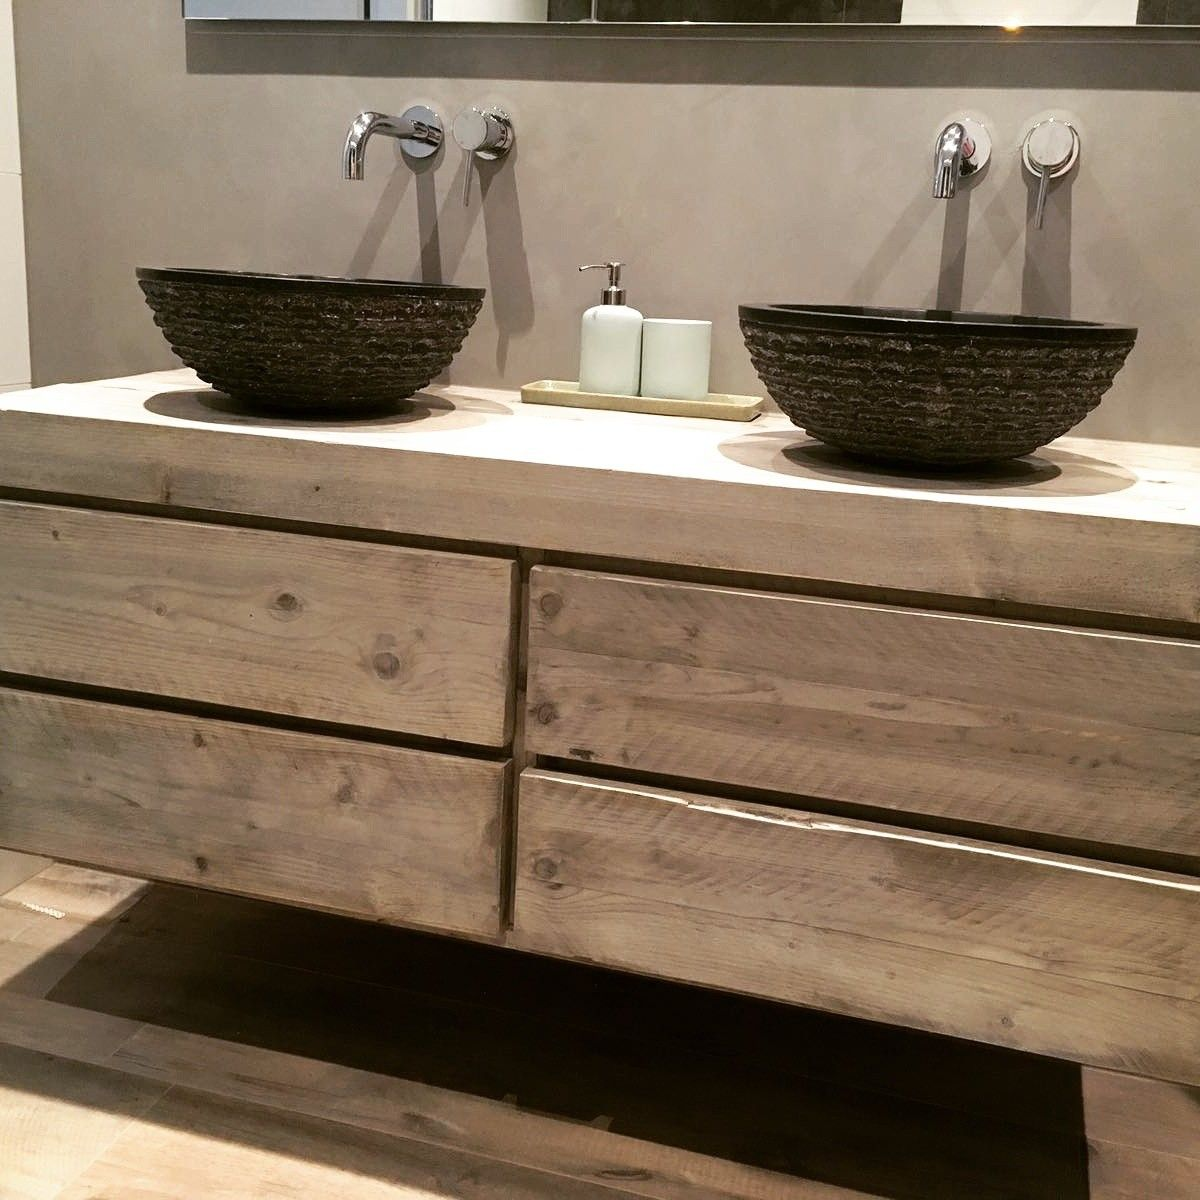 Zwevend badkamermeubel met 4 lades van steigerhout. www.woodchoice ...